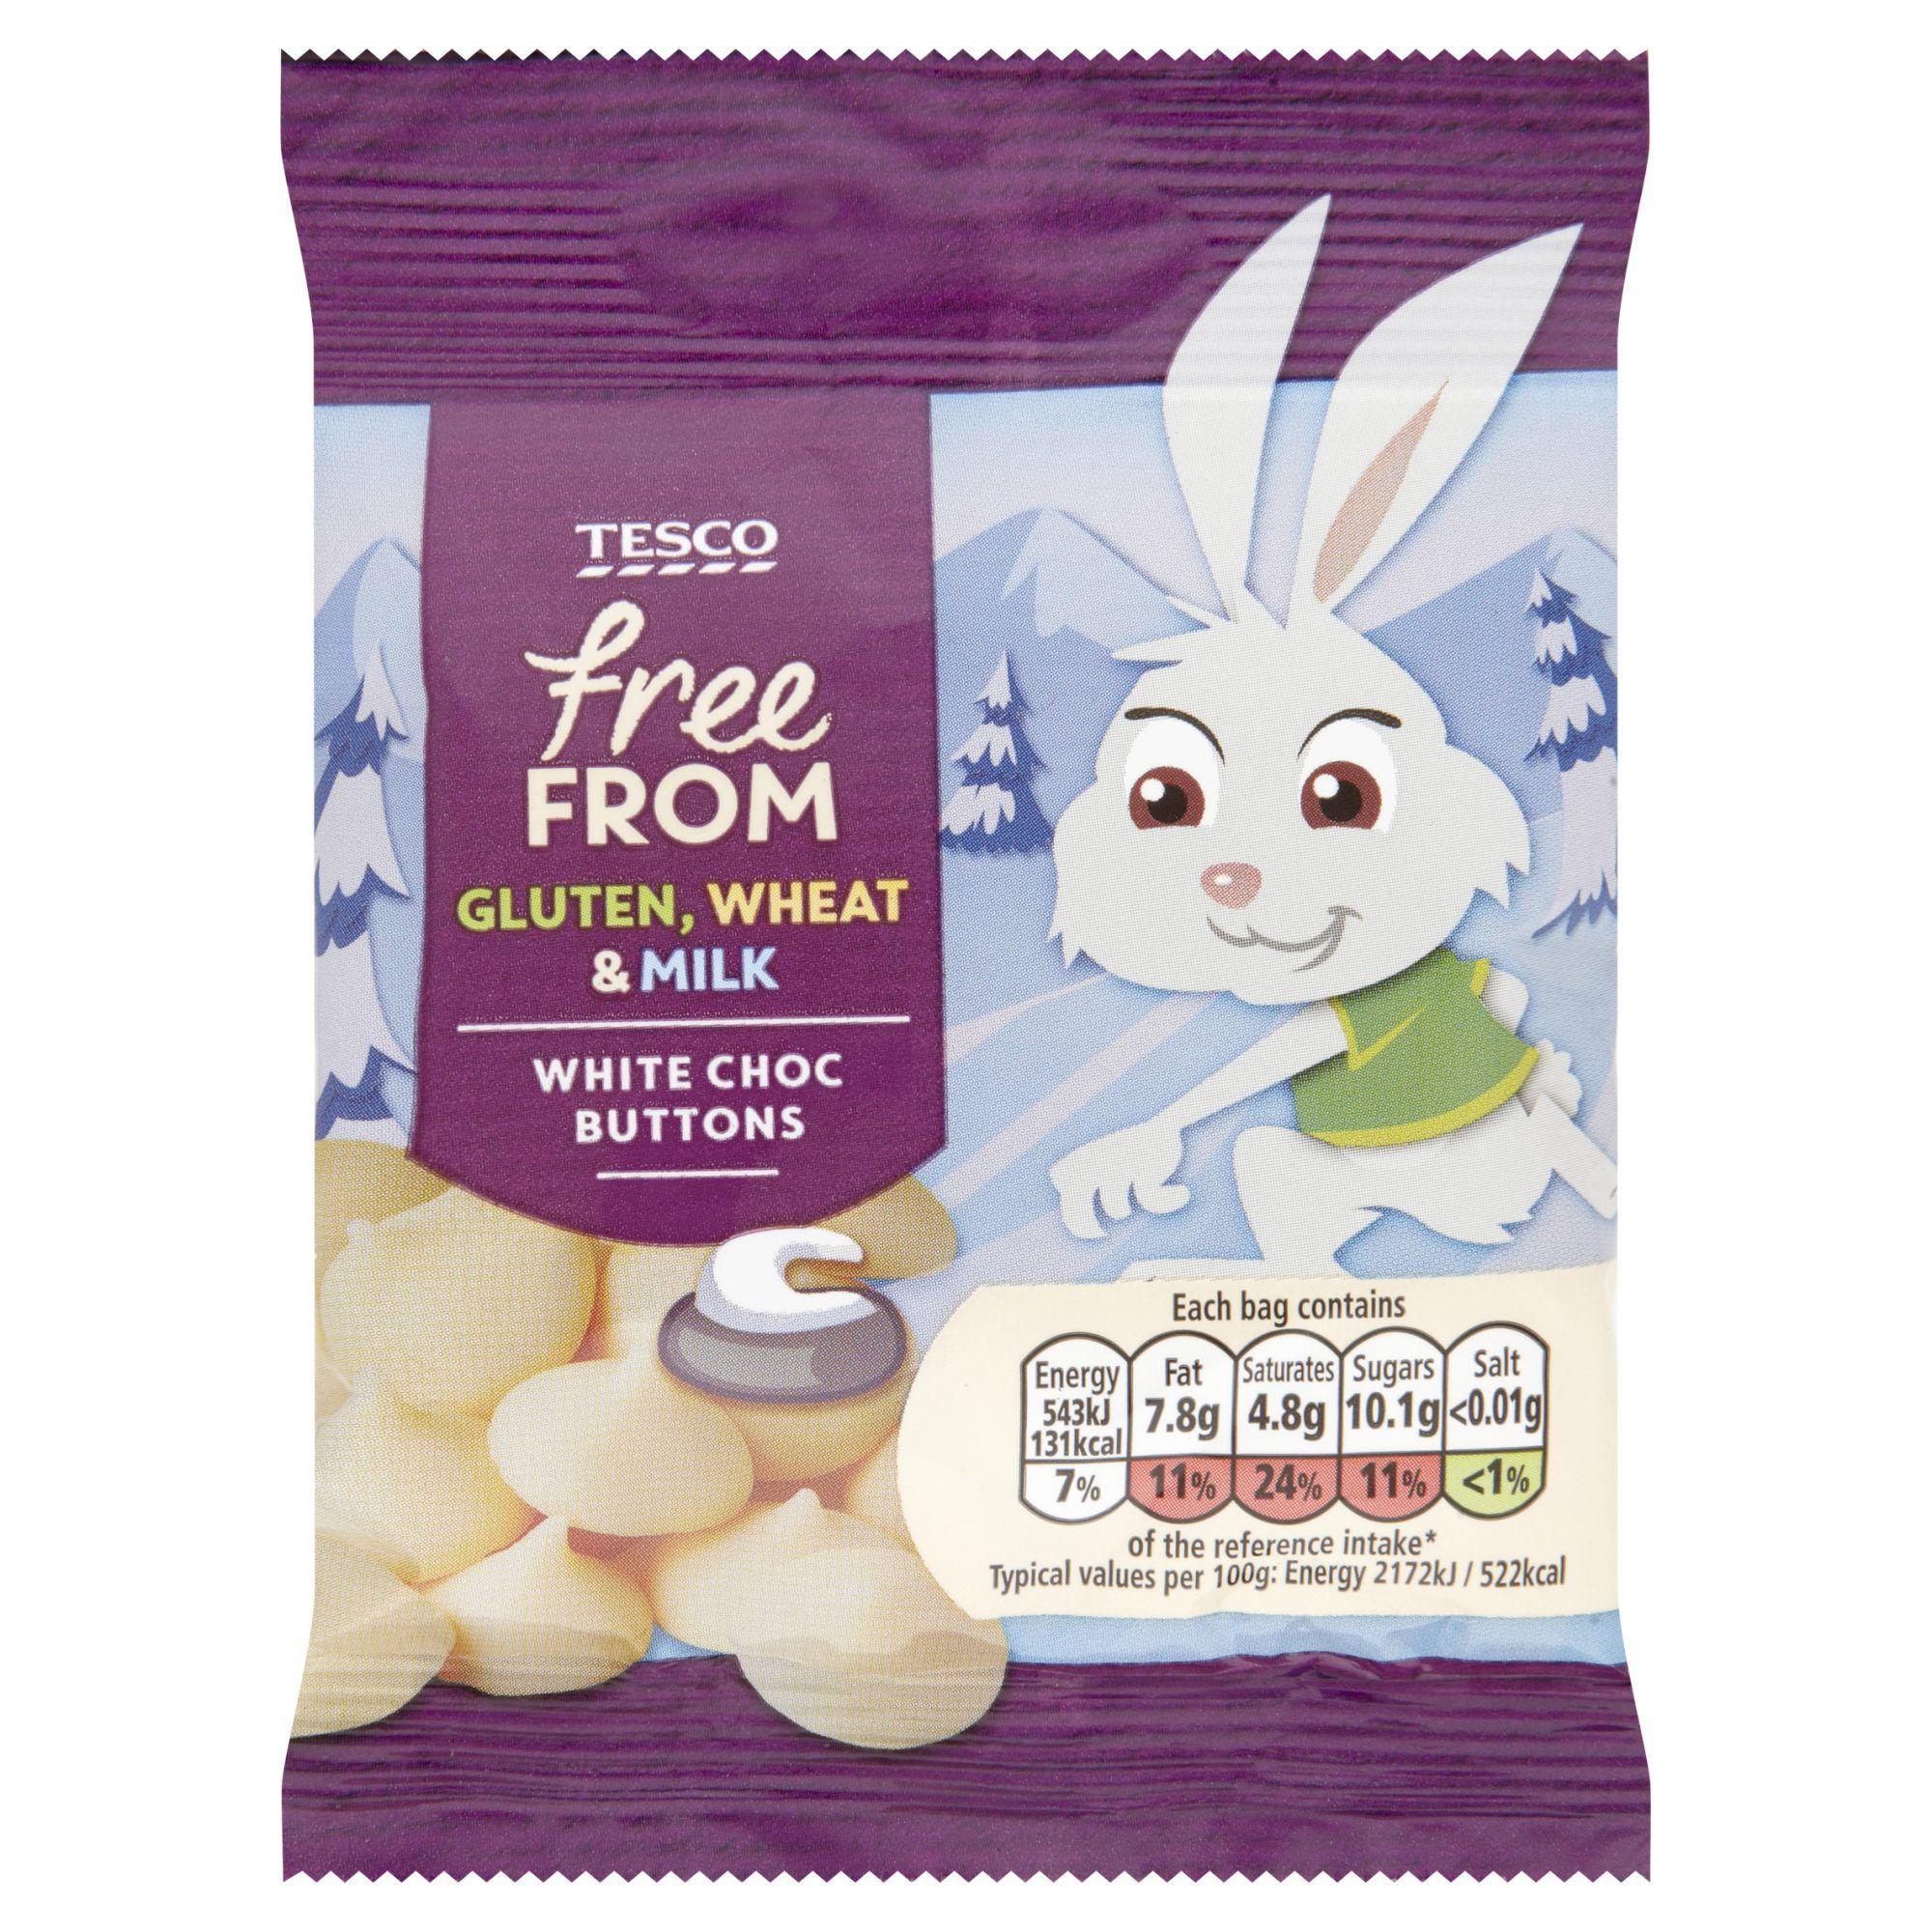 Rejoice Tesco Is Now Doing A Vegan Chocolate Selection Box For Christmas Vegan Supermarket Vegan Snacks Chocolate Buttons